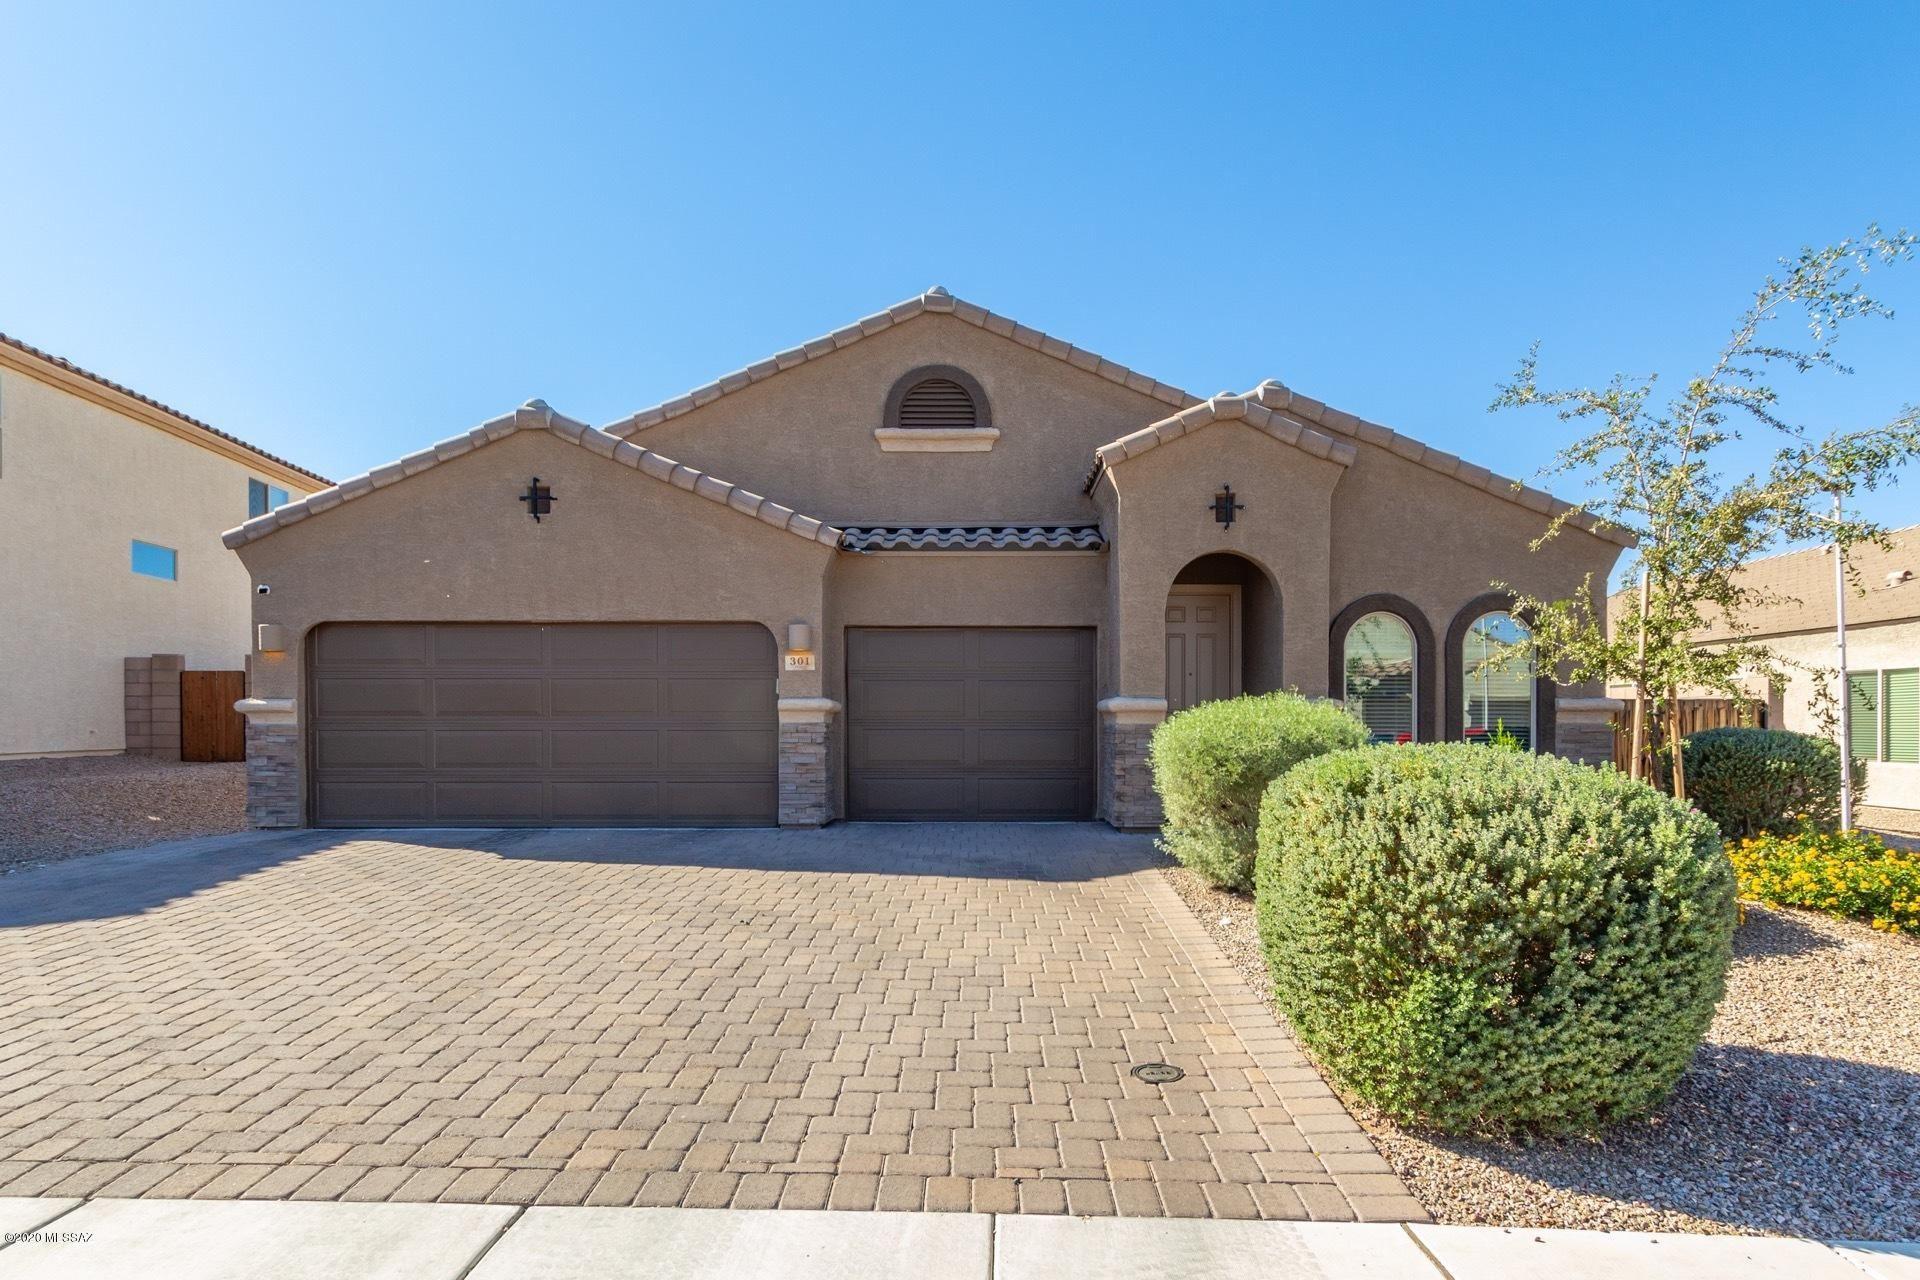 301 W Andrew Potter Street, Corona de Tucson, AZ 85641 - #: 22029743